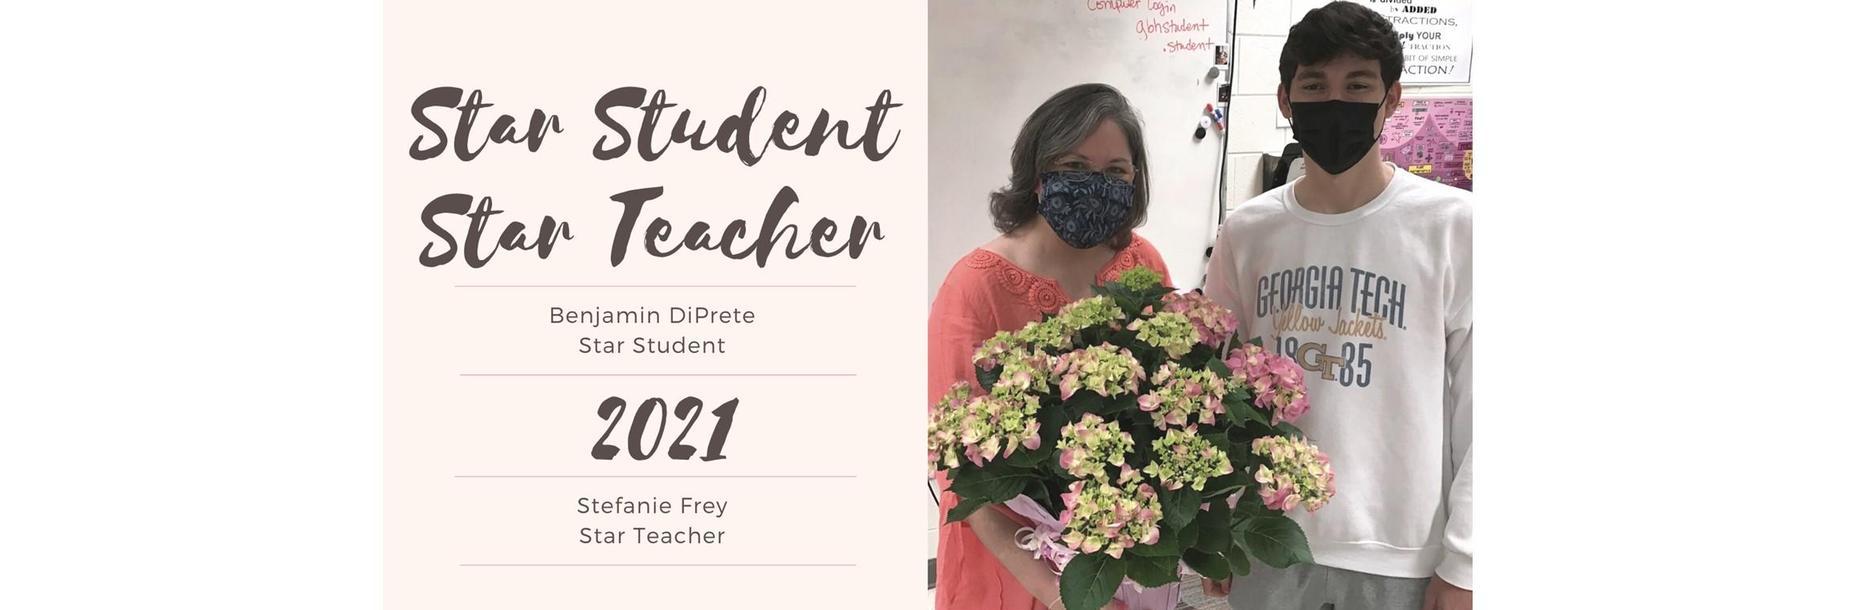 Star Student and Star Teacher